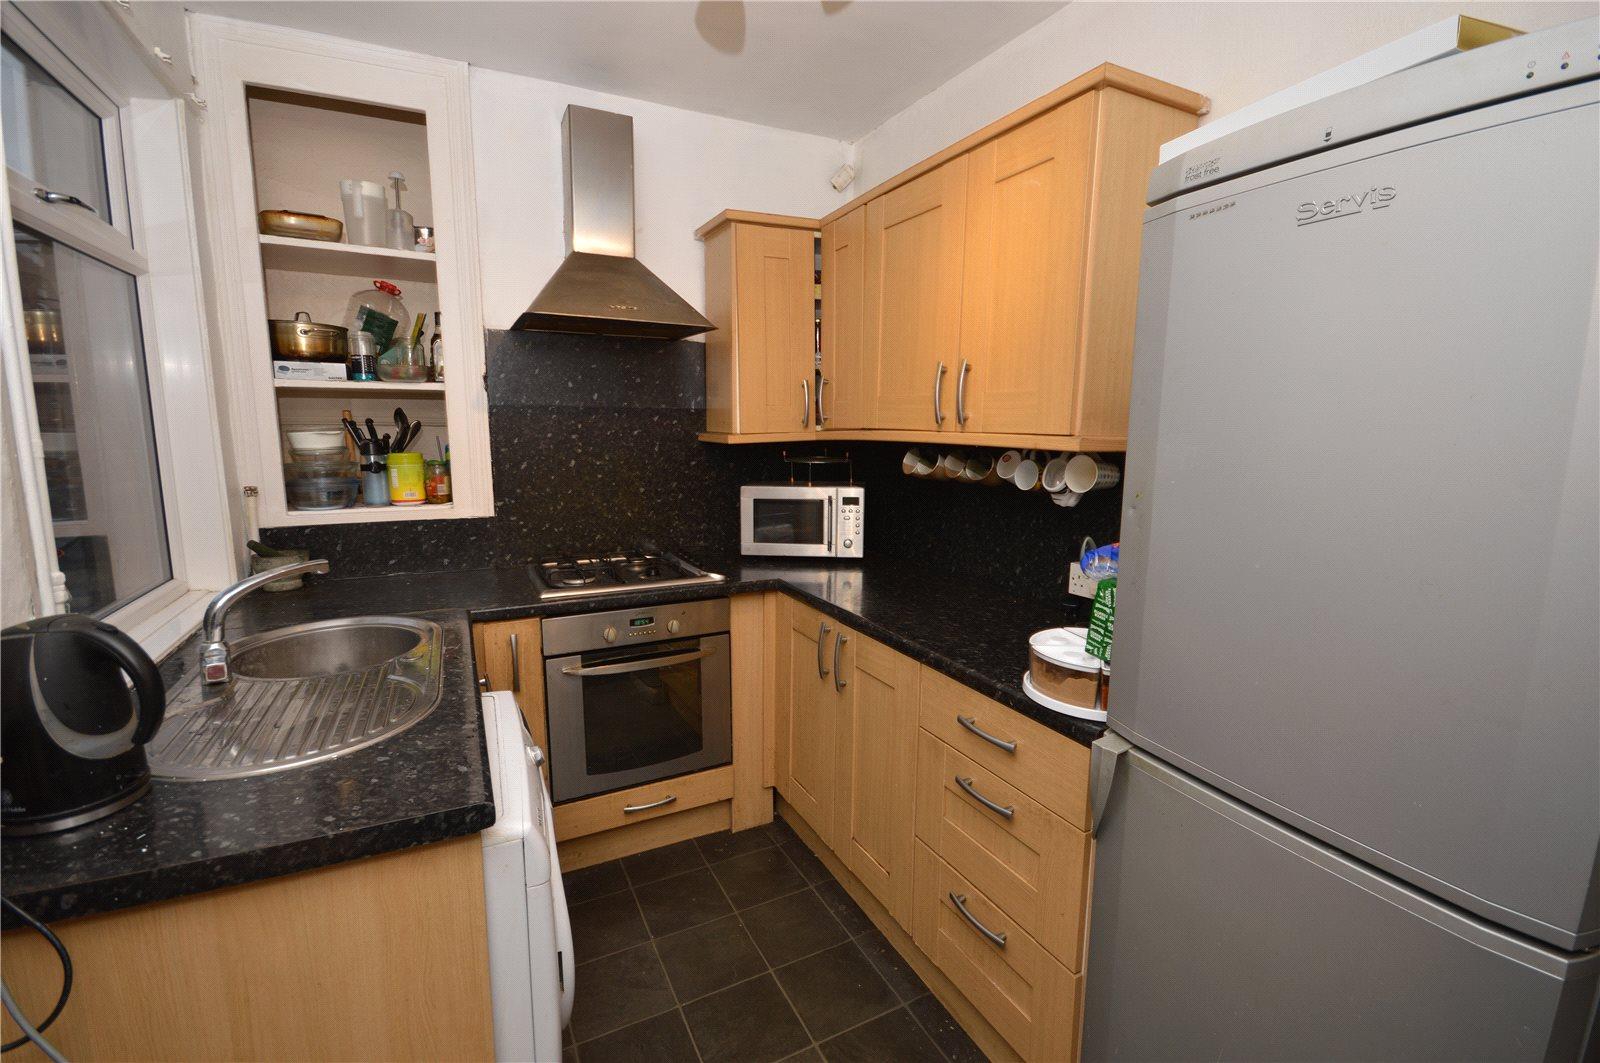 Property for sale in Beeston, interior kitchen